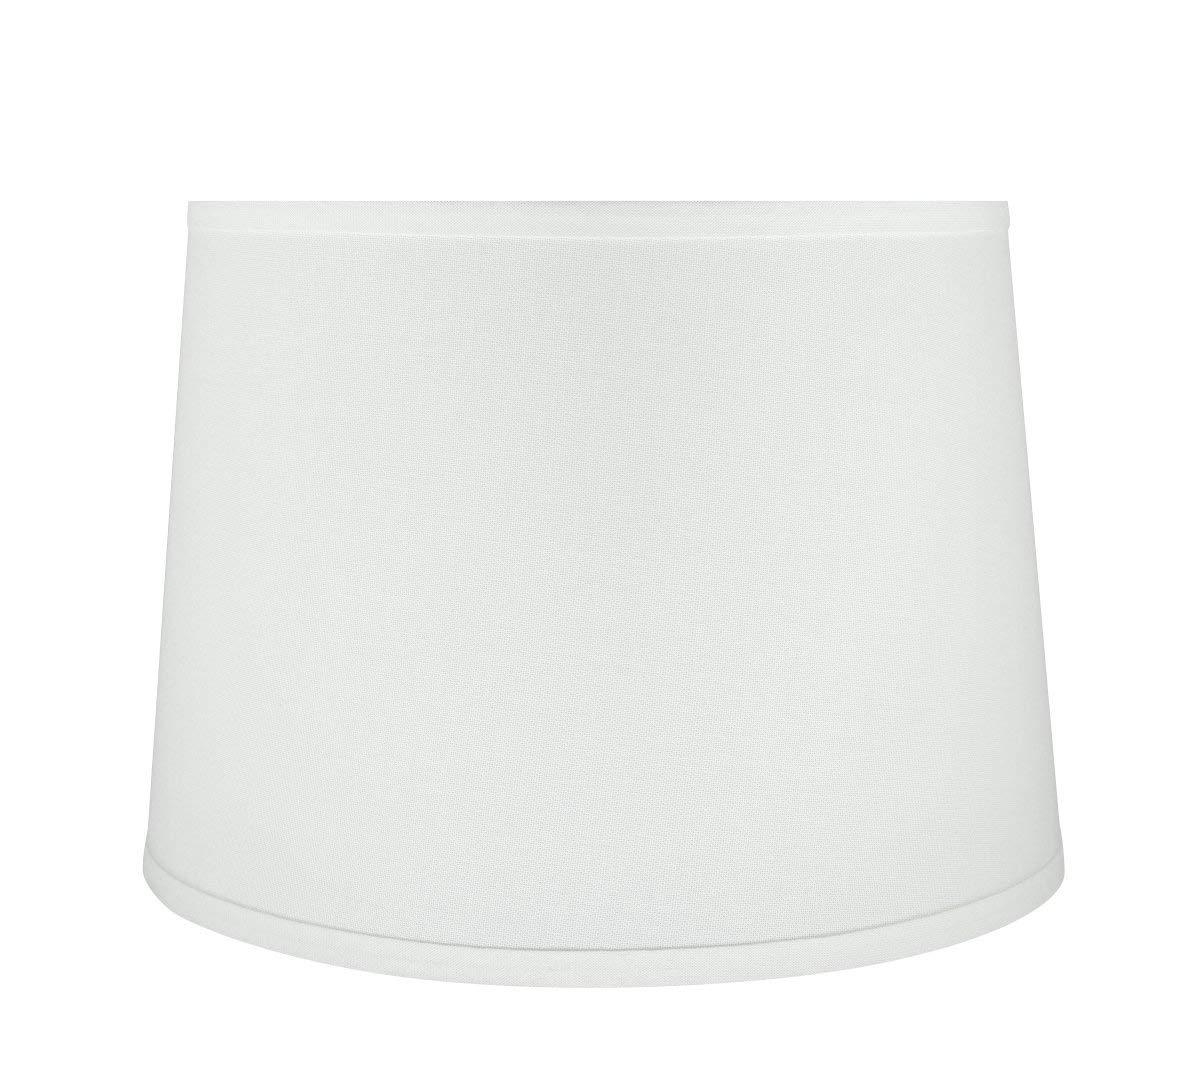 "Aspen Creative 32317 14"" Wide (12"" x 14"" x 10"") Transitional Hardback Empire Shaped Spider Construction Lamp Shade, White"